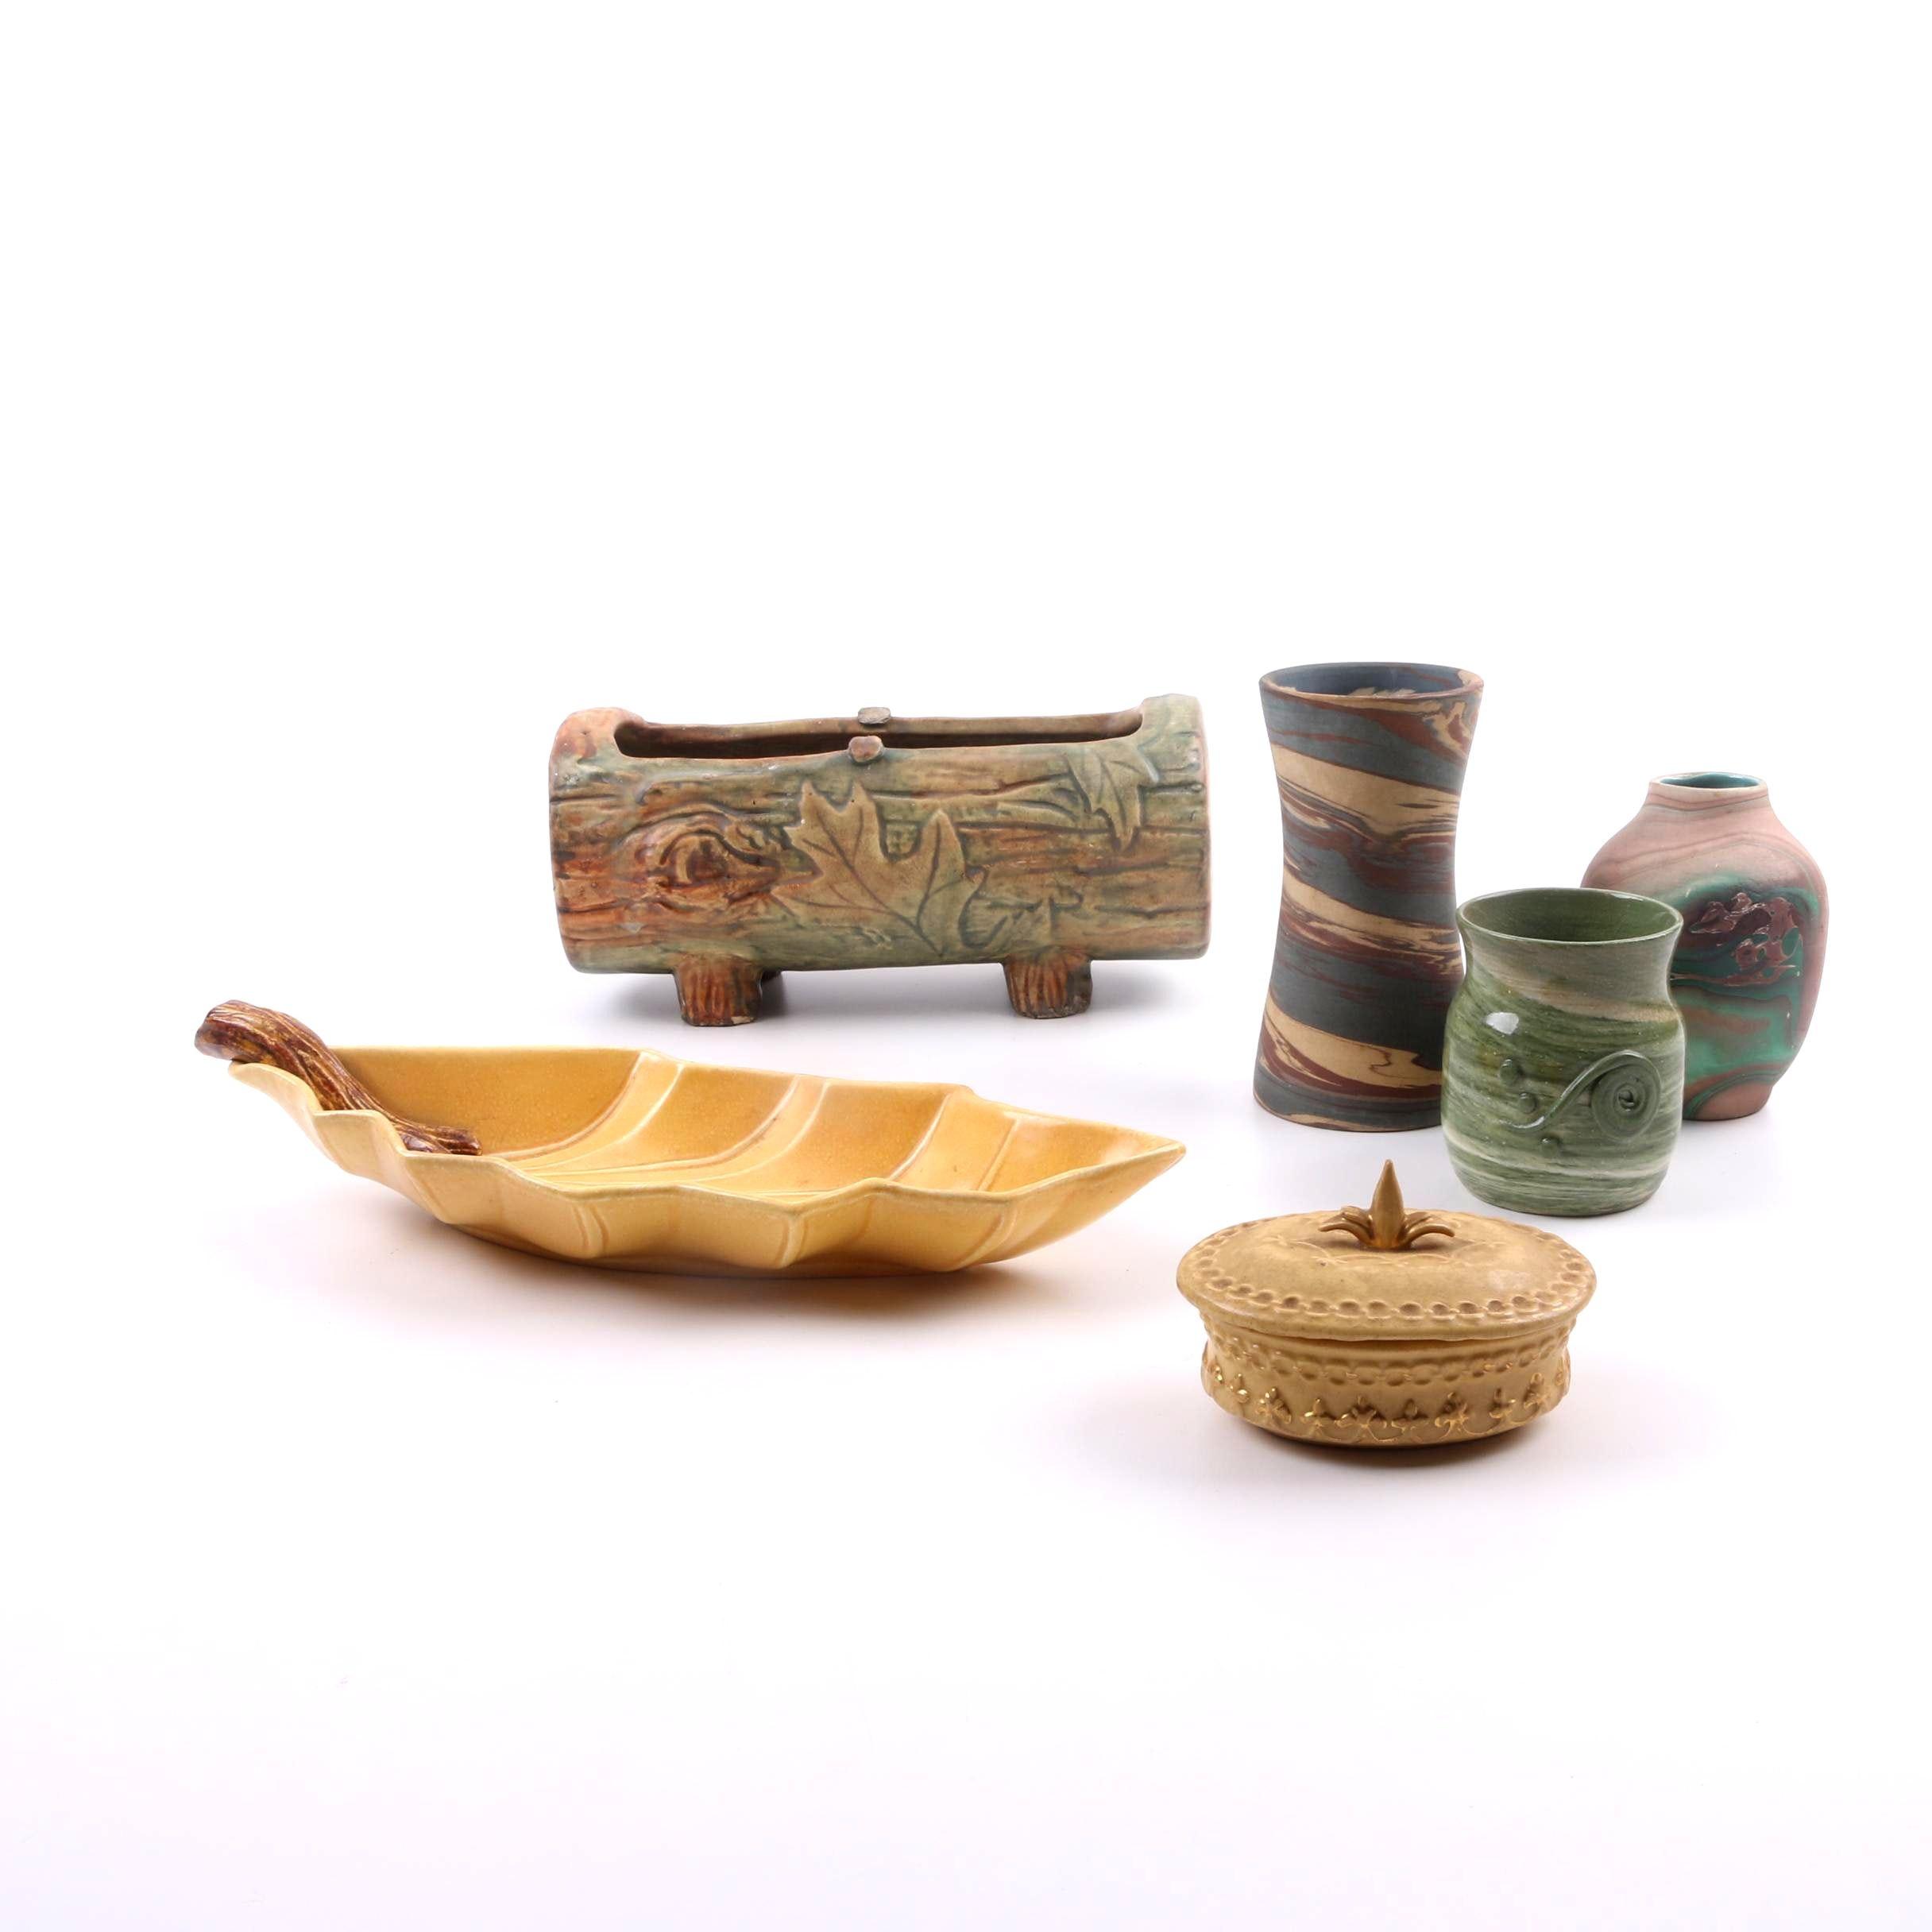 Weller, Niloak, Miramar and Bennie Pottery Pieces